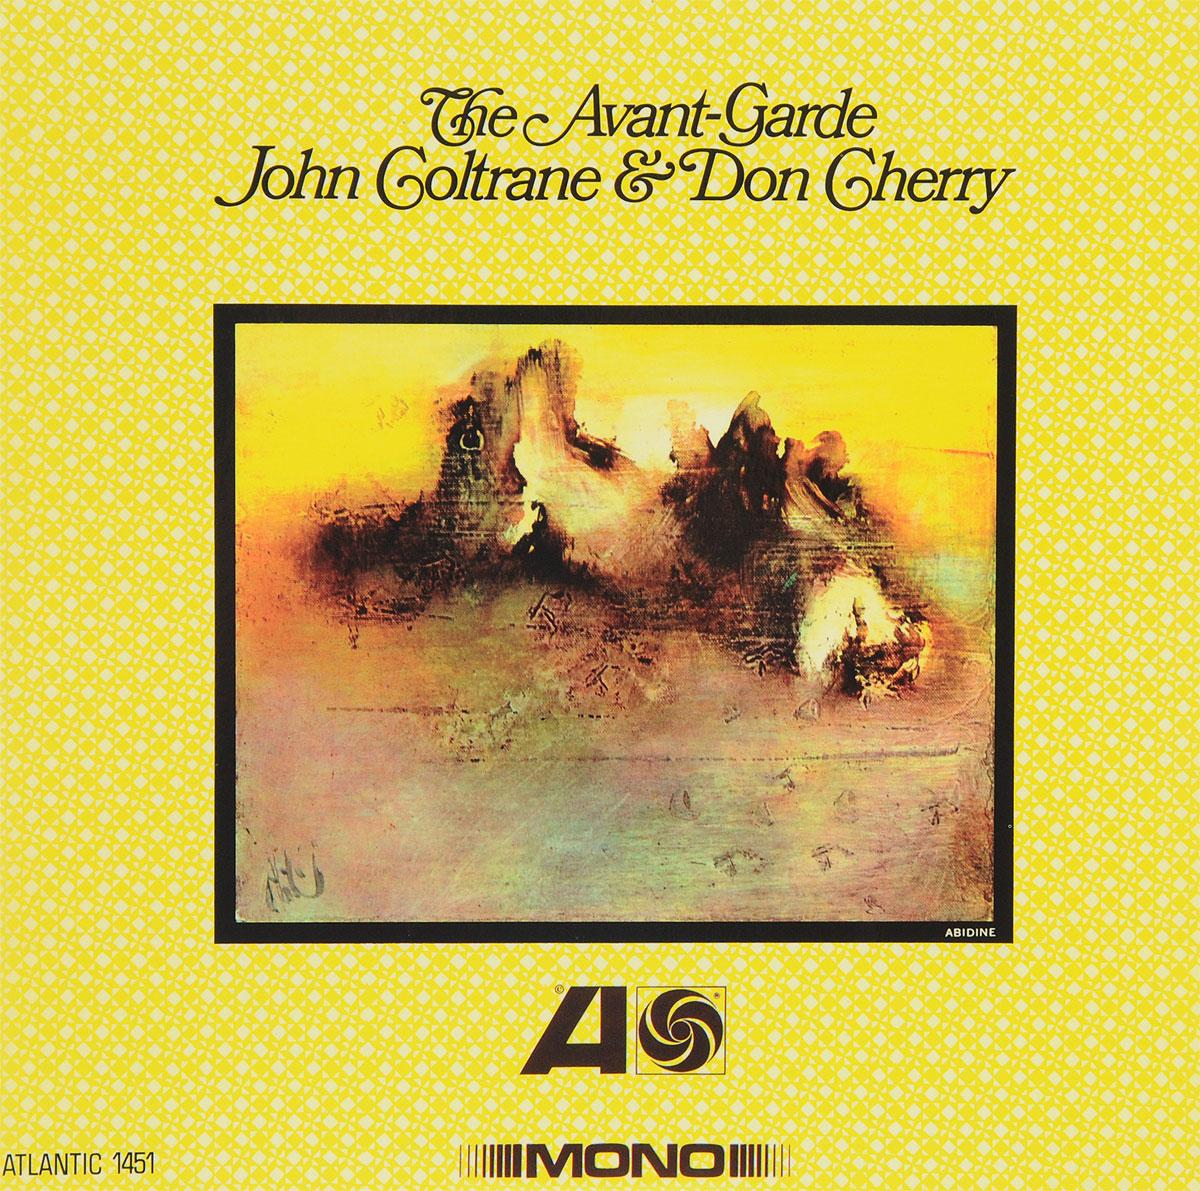 Джон Колтрейн,Дон Черри John Coltrane, Don Cherry. The Avant-Garde (LP) john coltrane john coltrane don cherry the avant garde mono remaster 180 gr